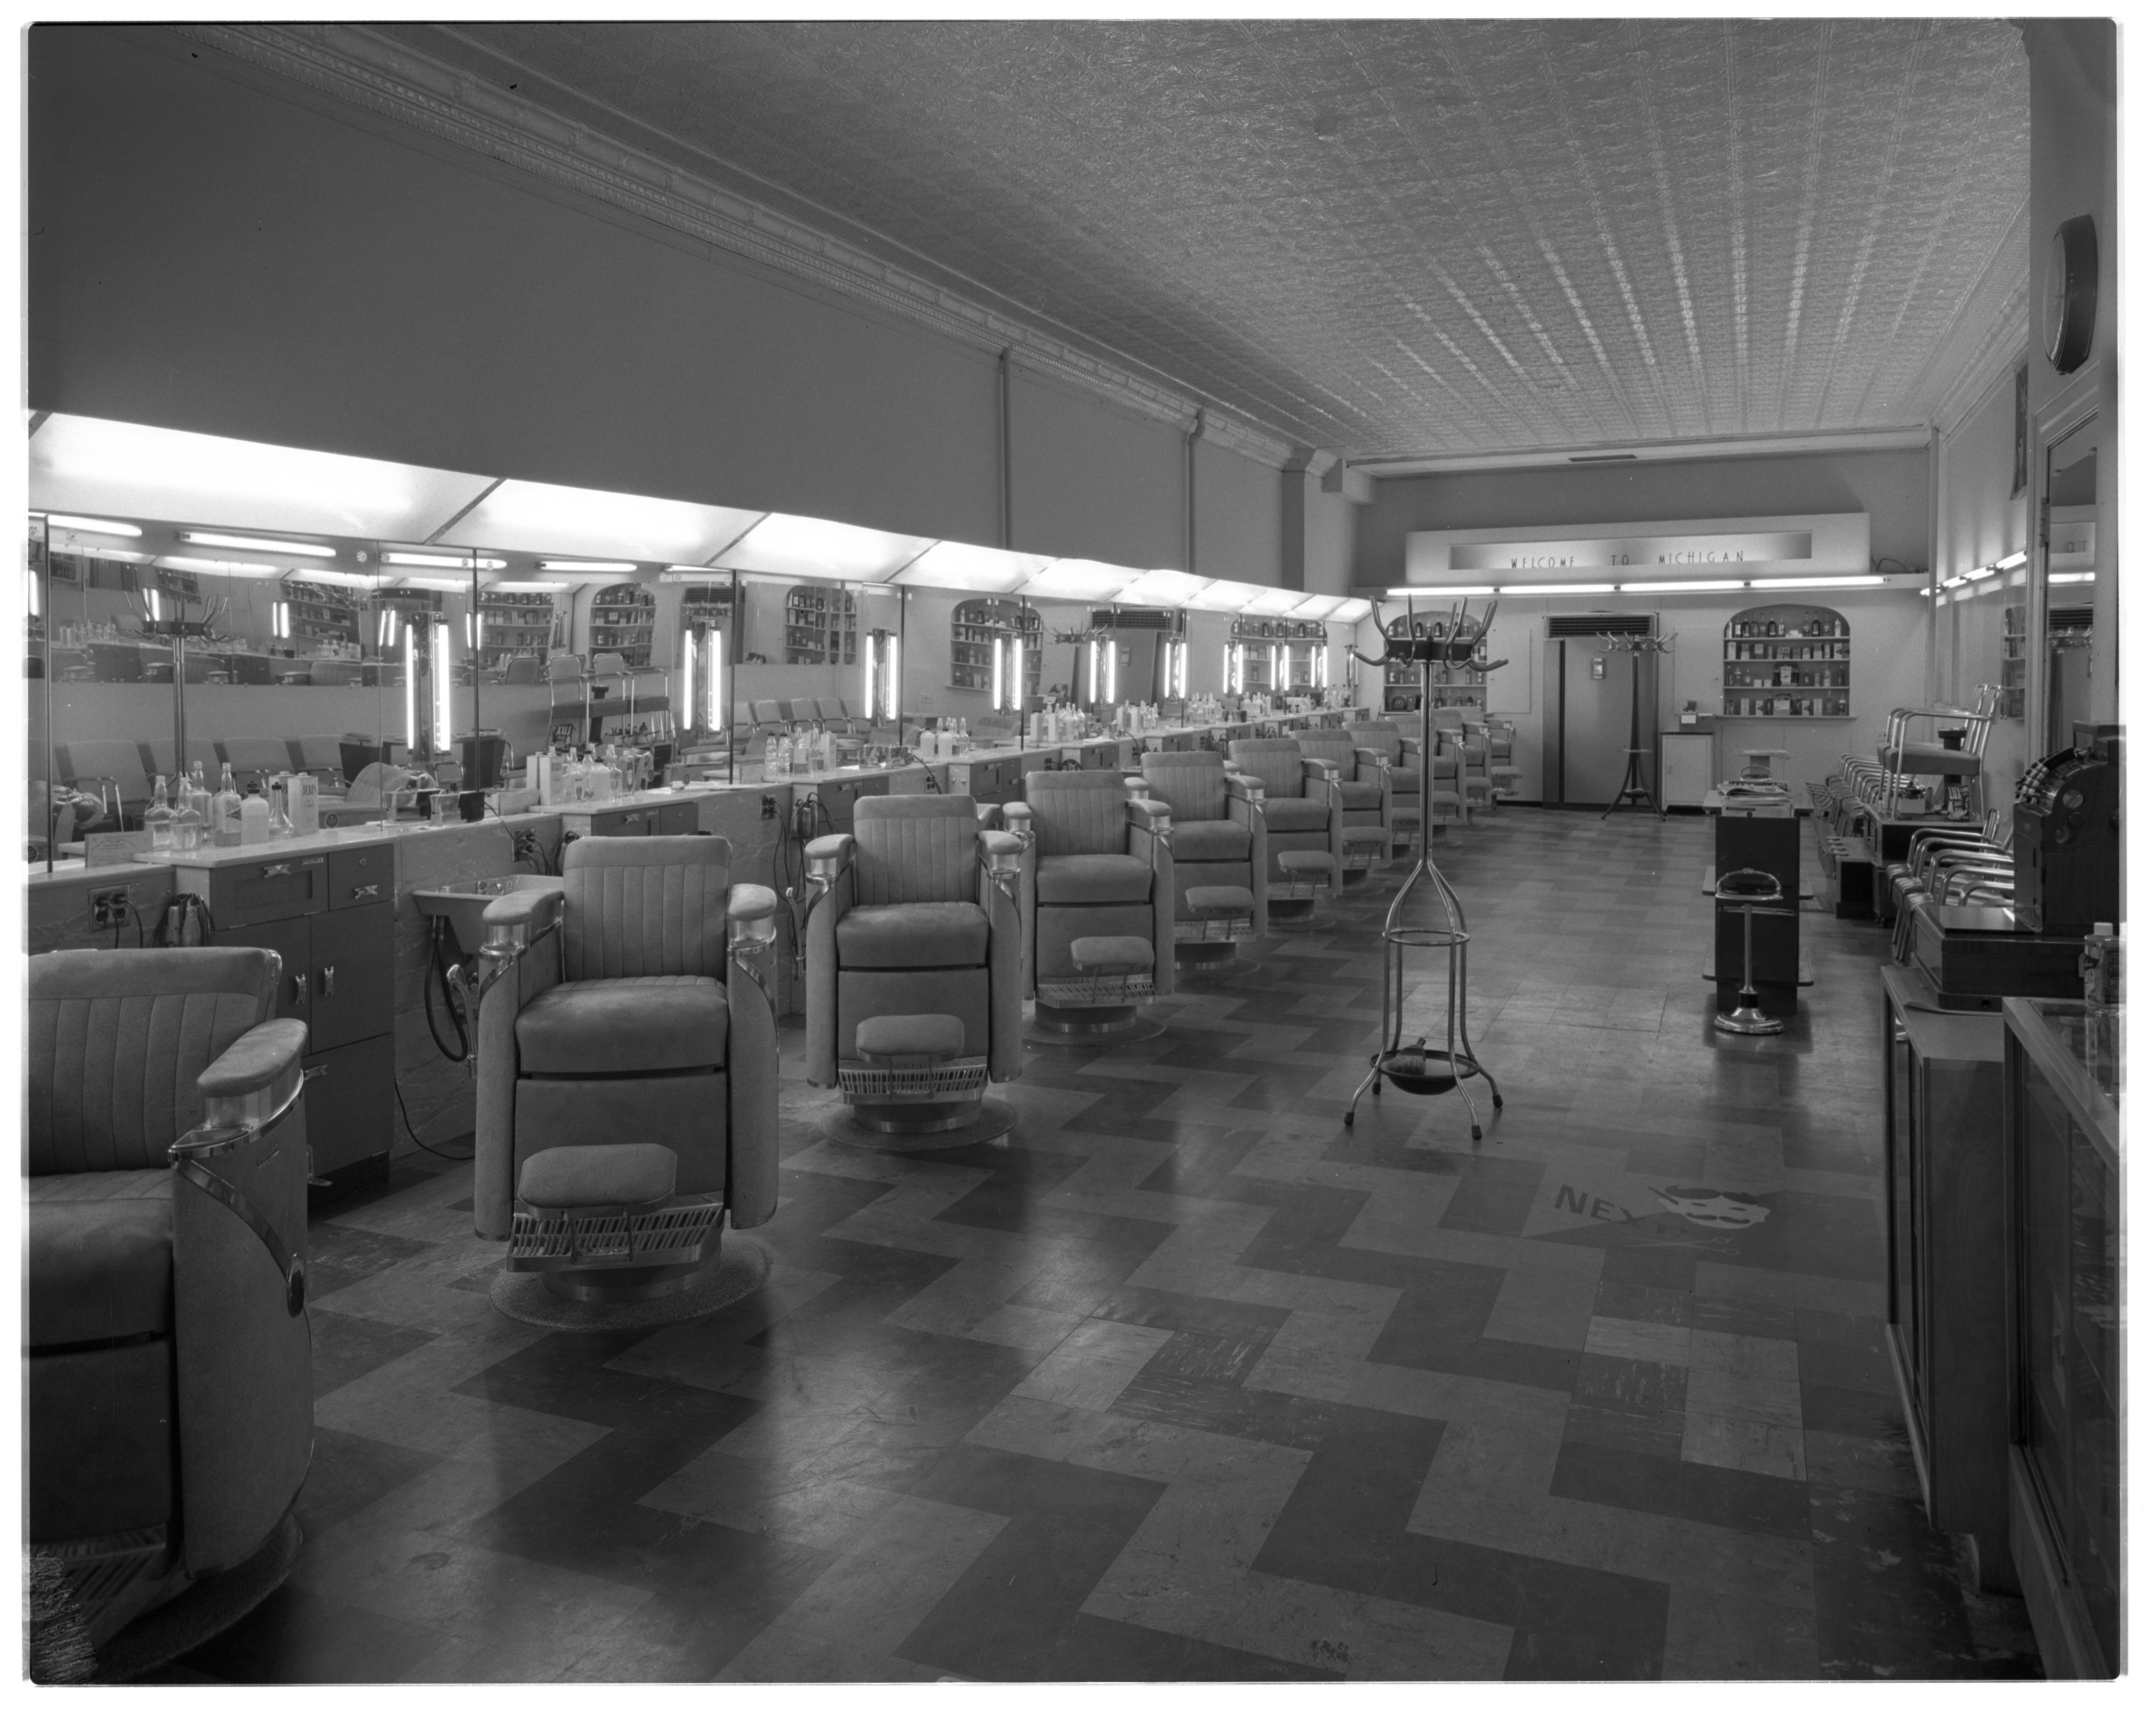 Barber Ypsilanti : Dascola Barber Shop $2,500 front remodeling program. A new glass ...